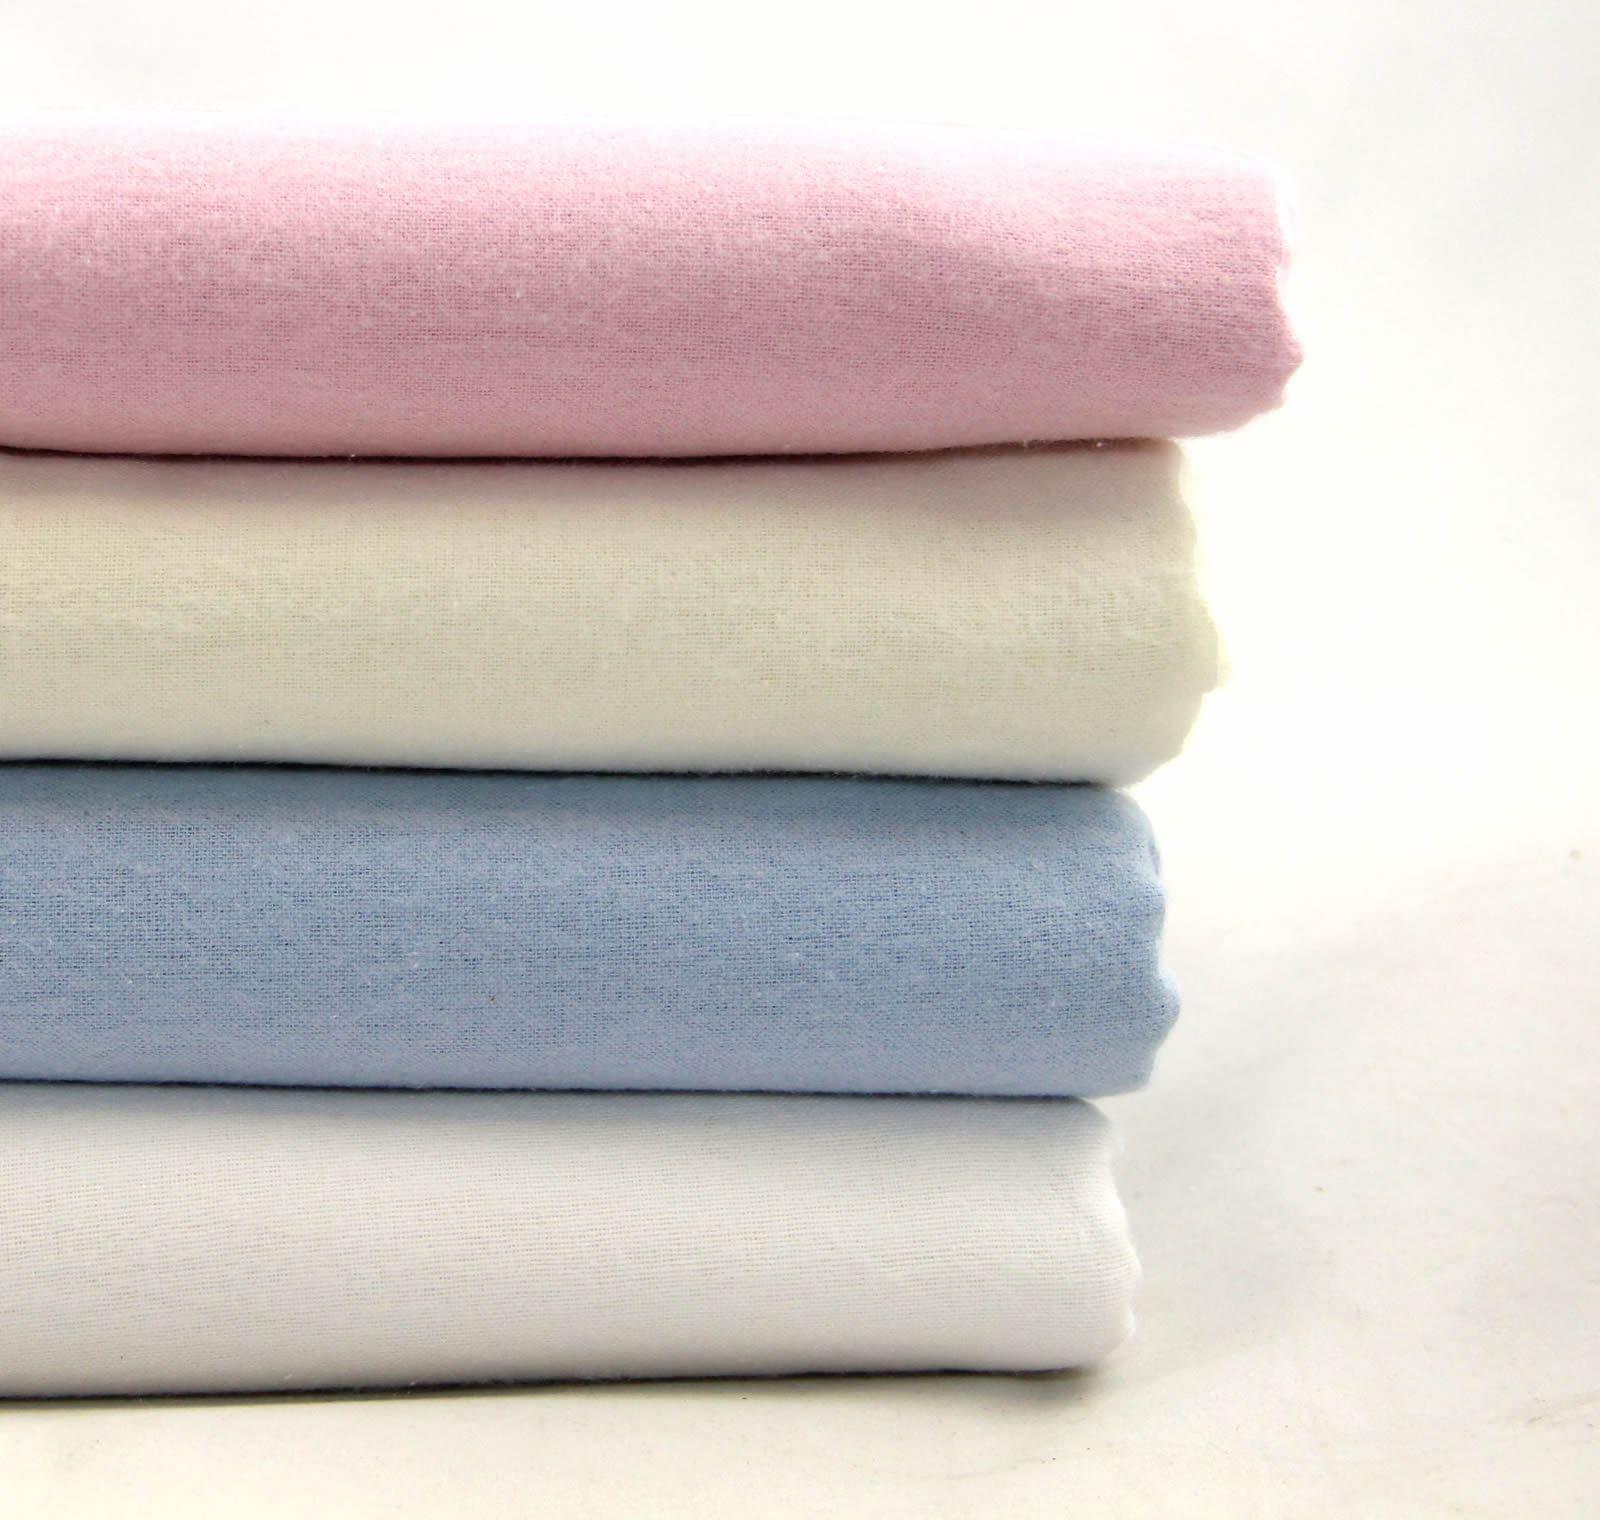 100 brushed cotton thermal flannelette fitted flat sheets. Black Bedroom Furniture Sets. Home Design Ideas